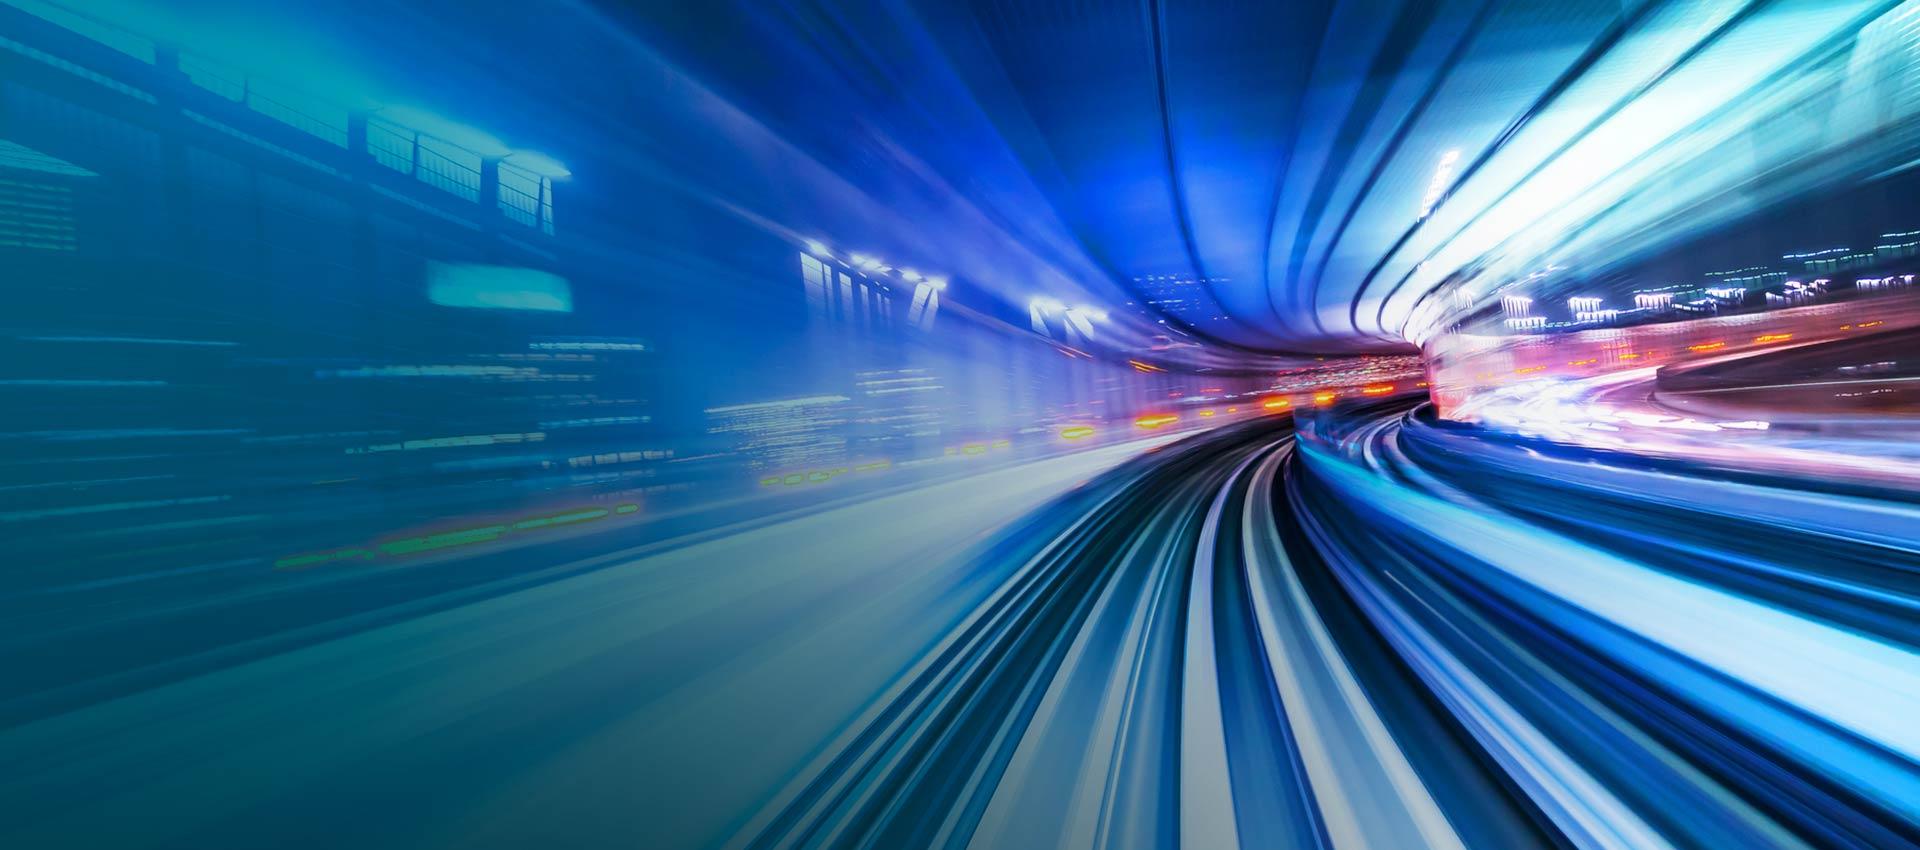 C3 IoT - Why Legacy Companies Must Reinvent—or Die